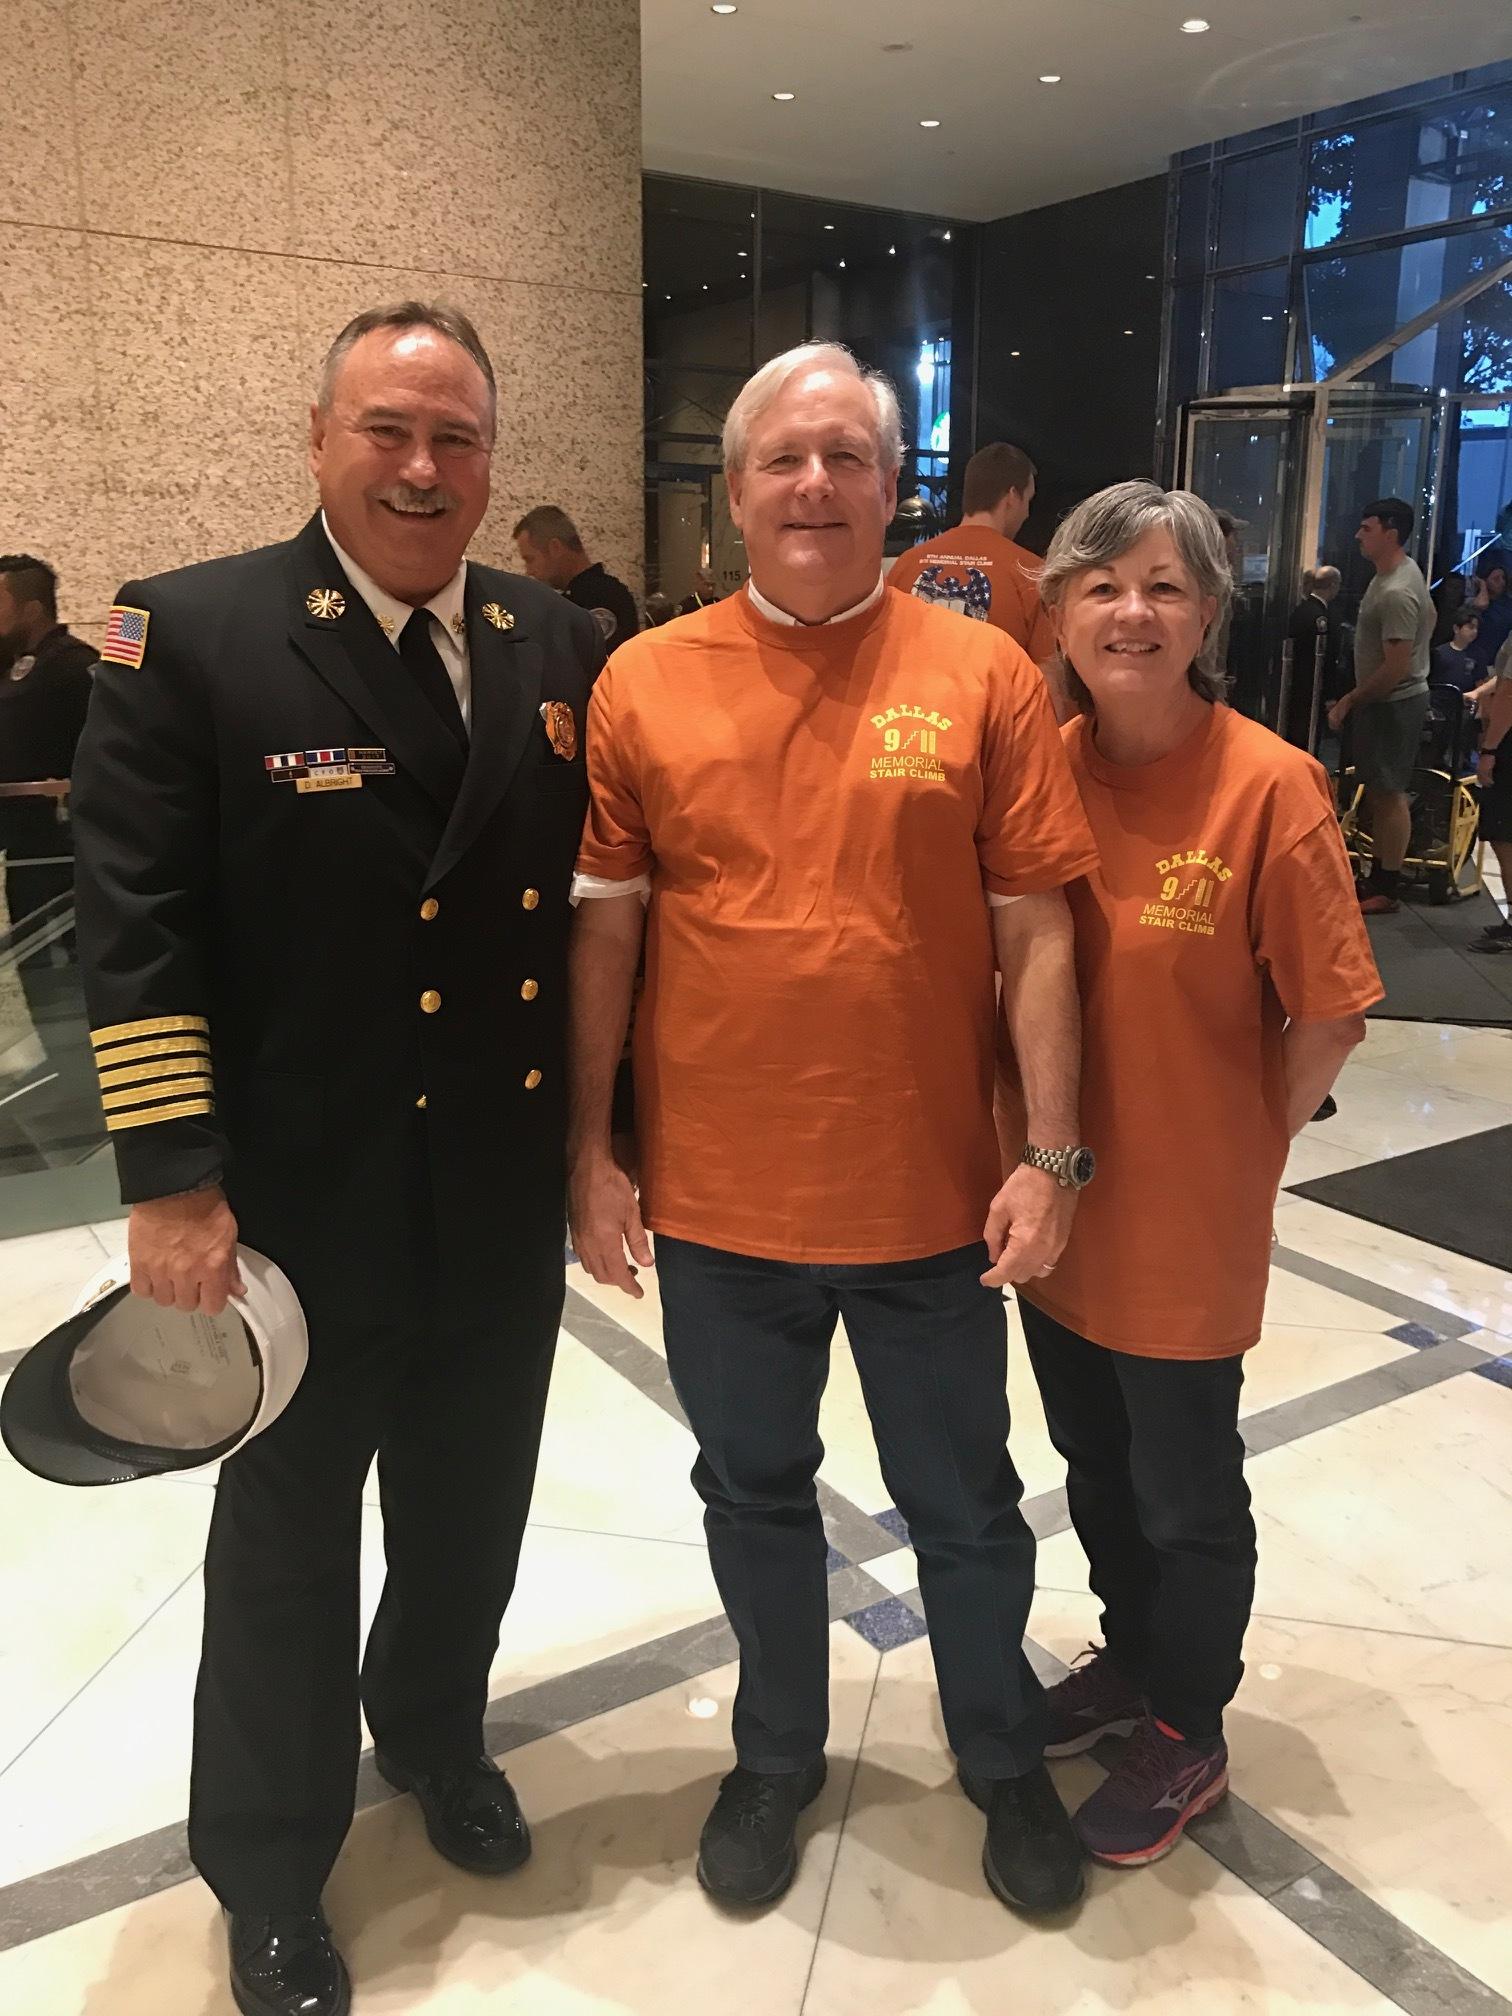 Murphy Fire Chief Del Albright, council member and CERT member Don Reilly and CERT member Maria Reilly.